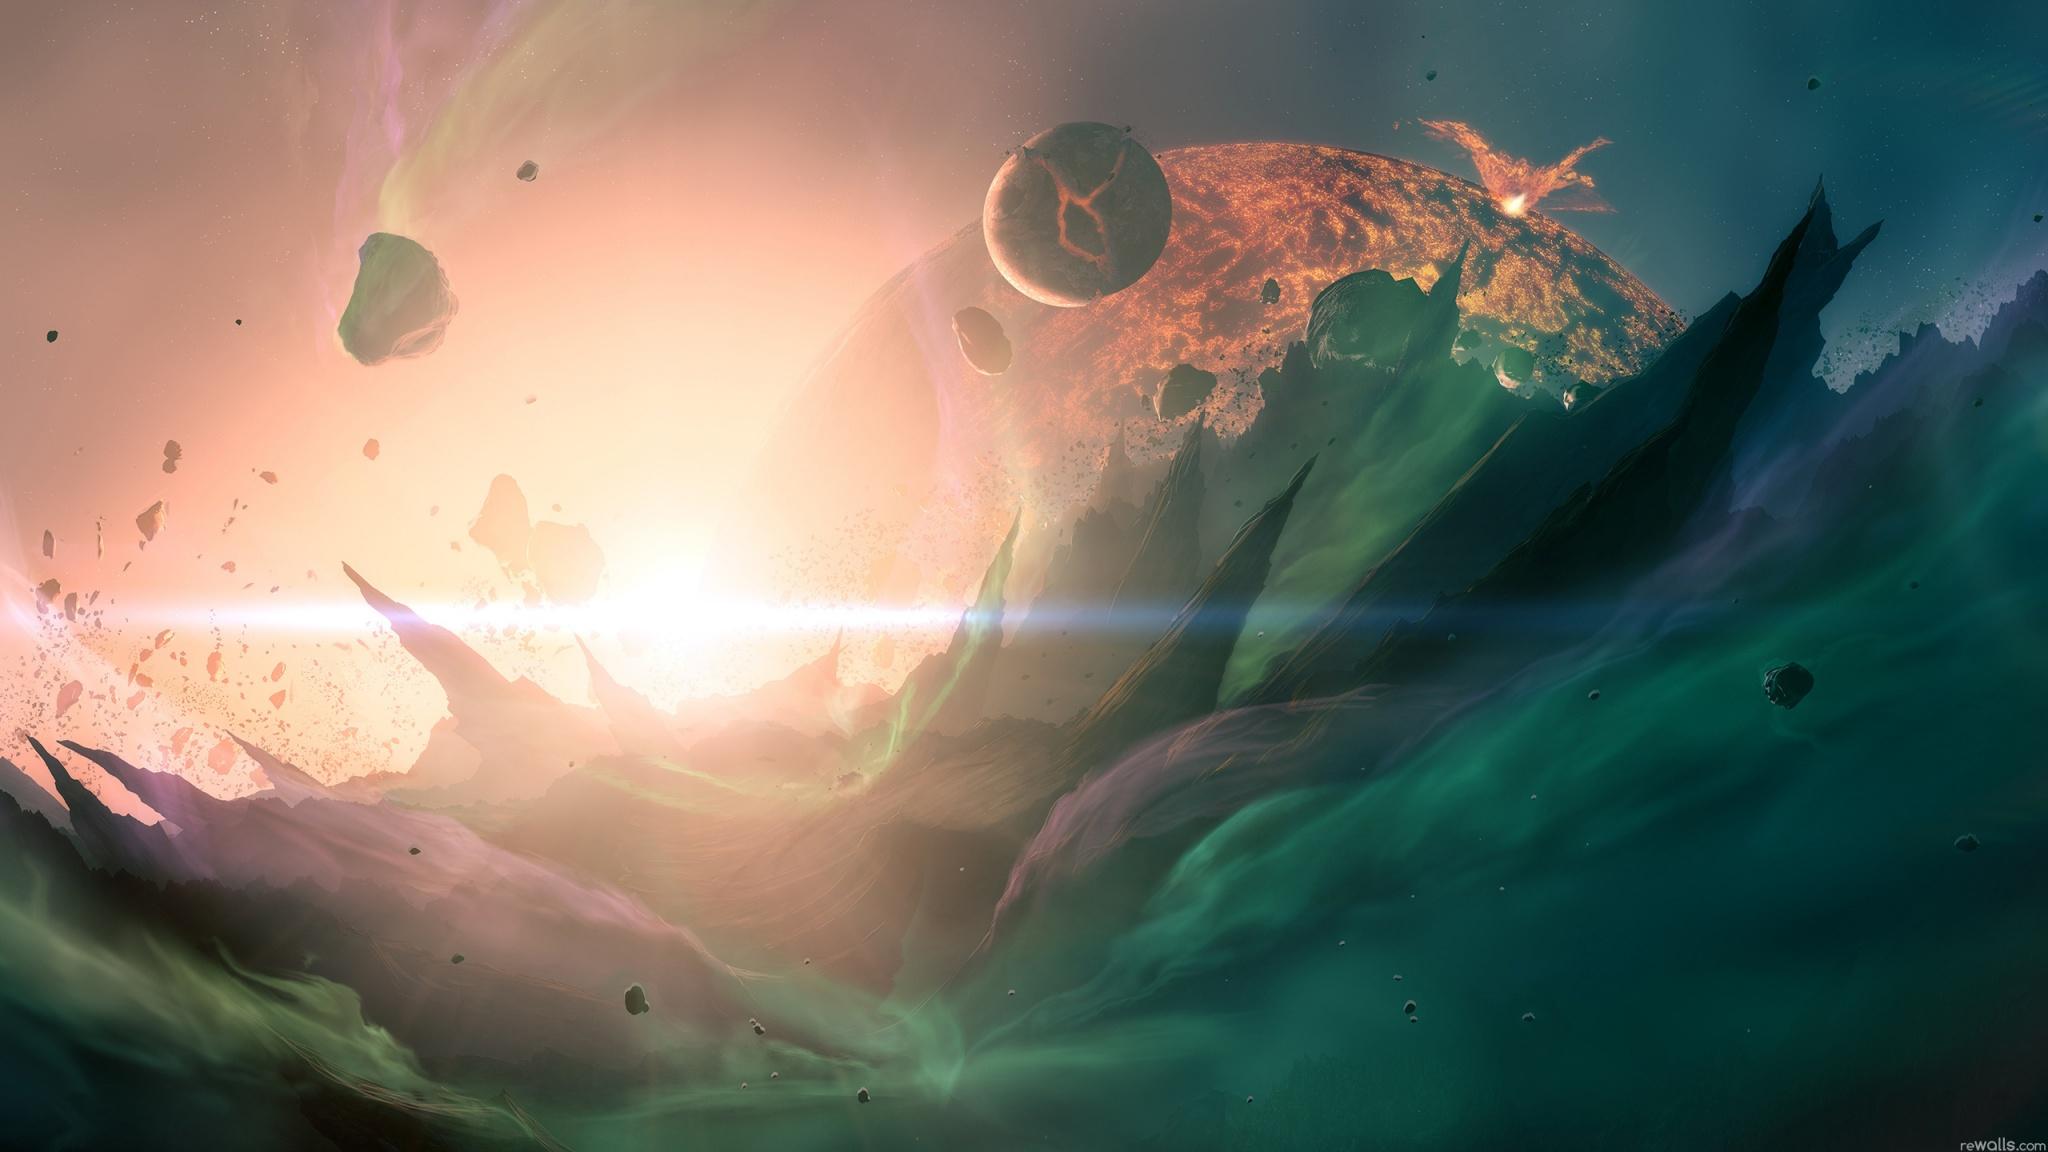 Explosion Fantasy 2048 x 1152 Download Close 2048x1152